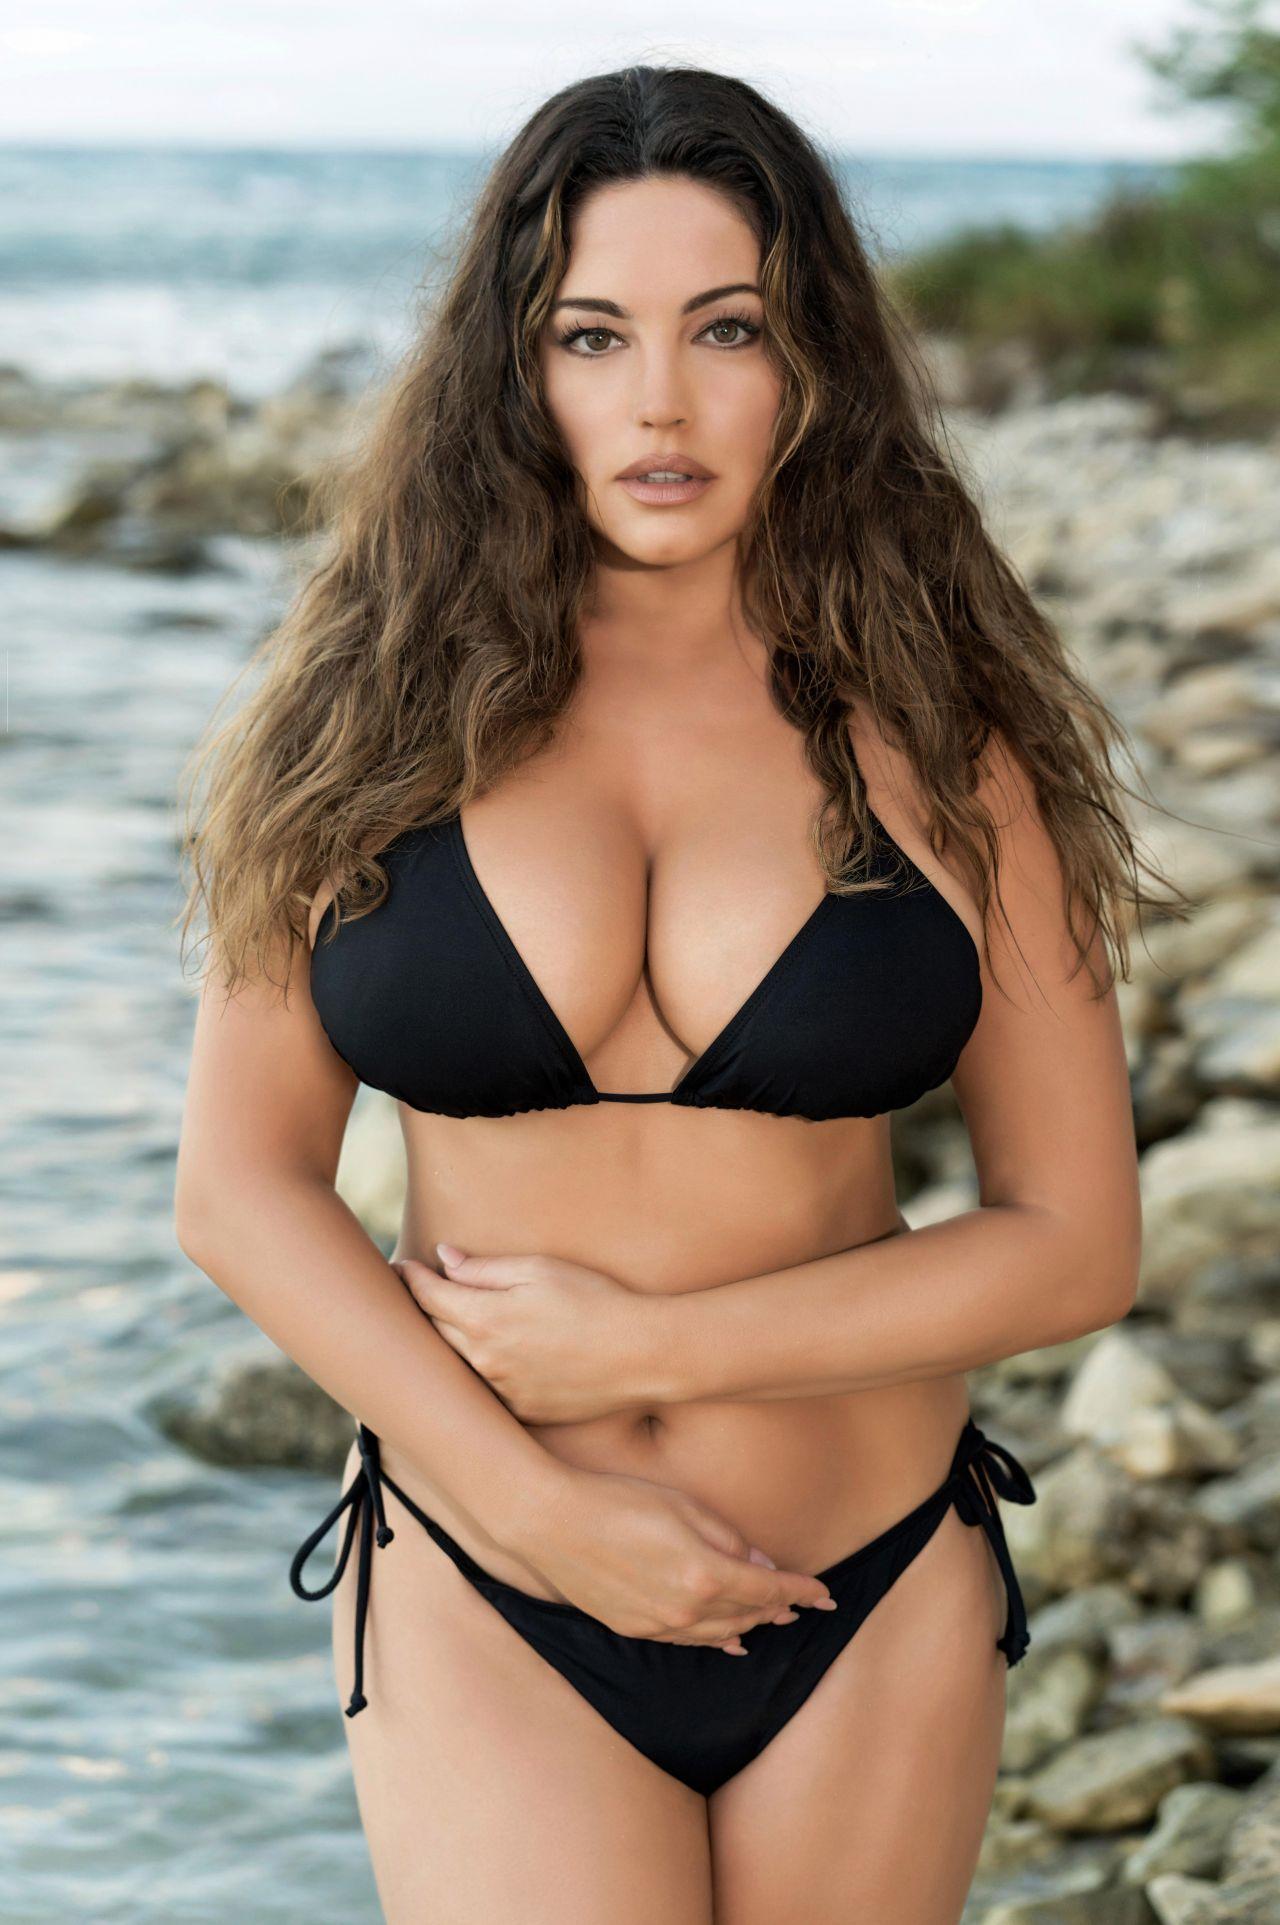 Kelly Brook Photoshoot For 2019 Calendar | Celebrities ...